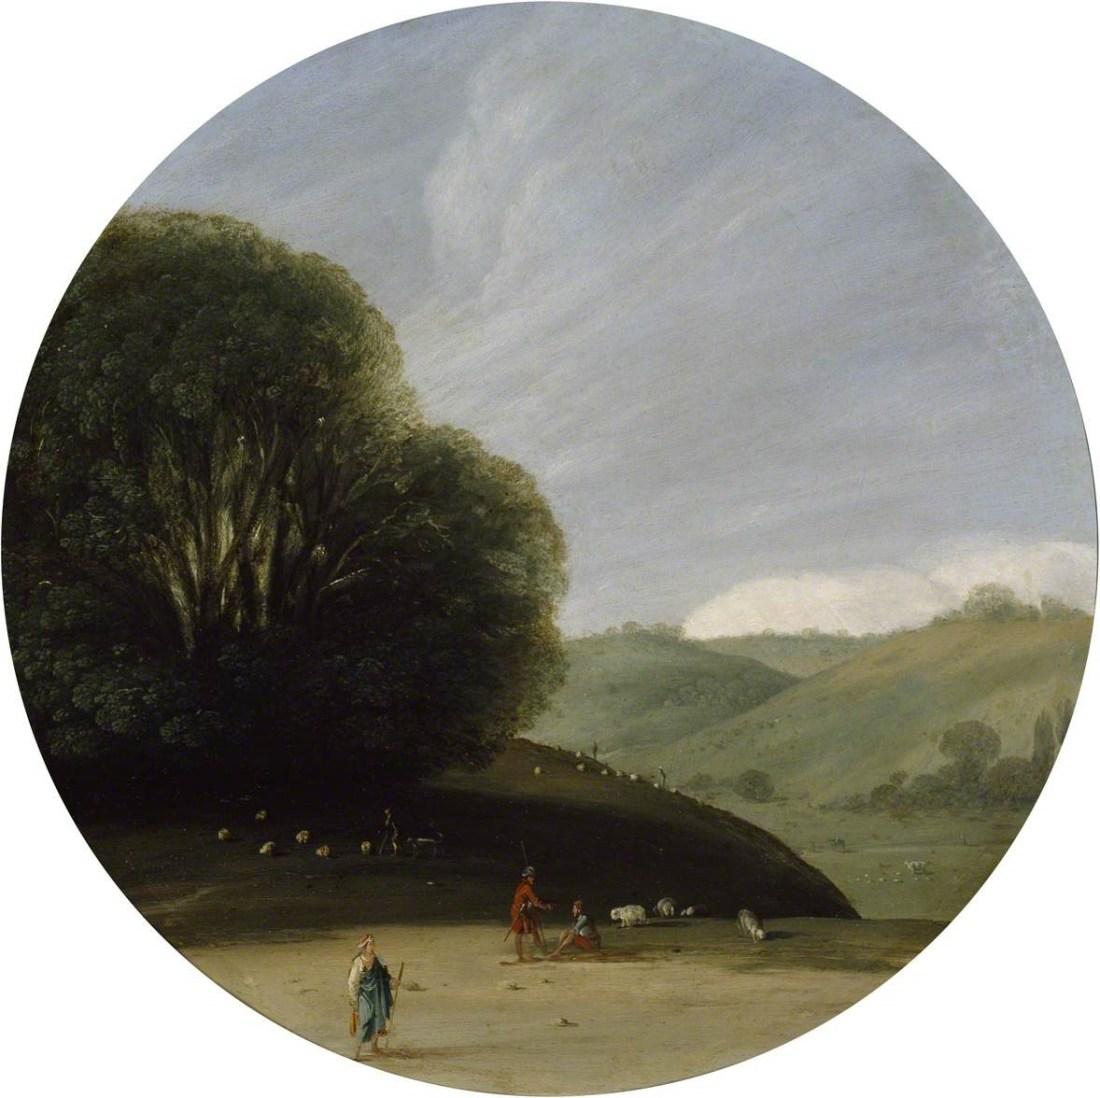 Wals, Goffredo, c.1605-c.1638; Landscape with pastoral Figures